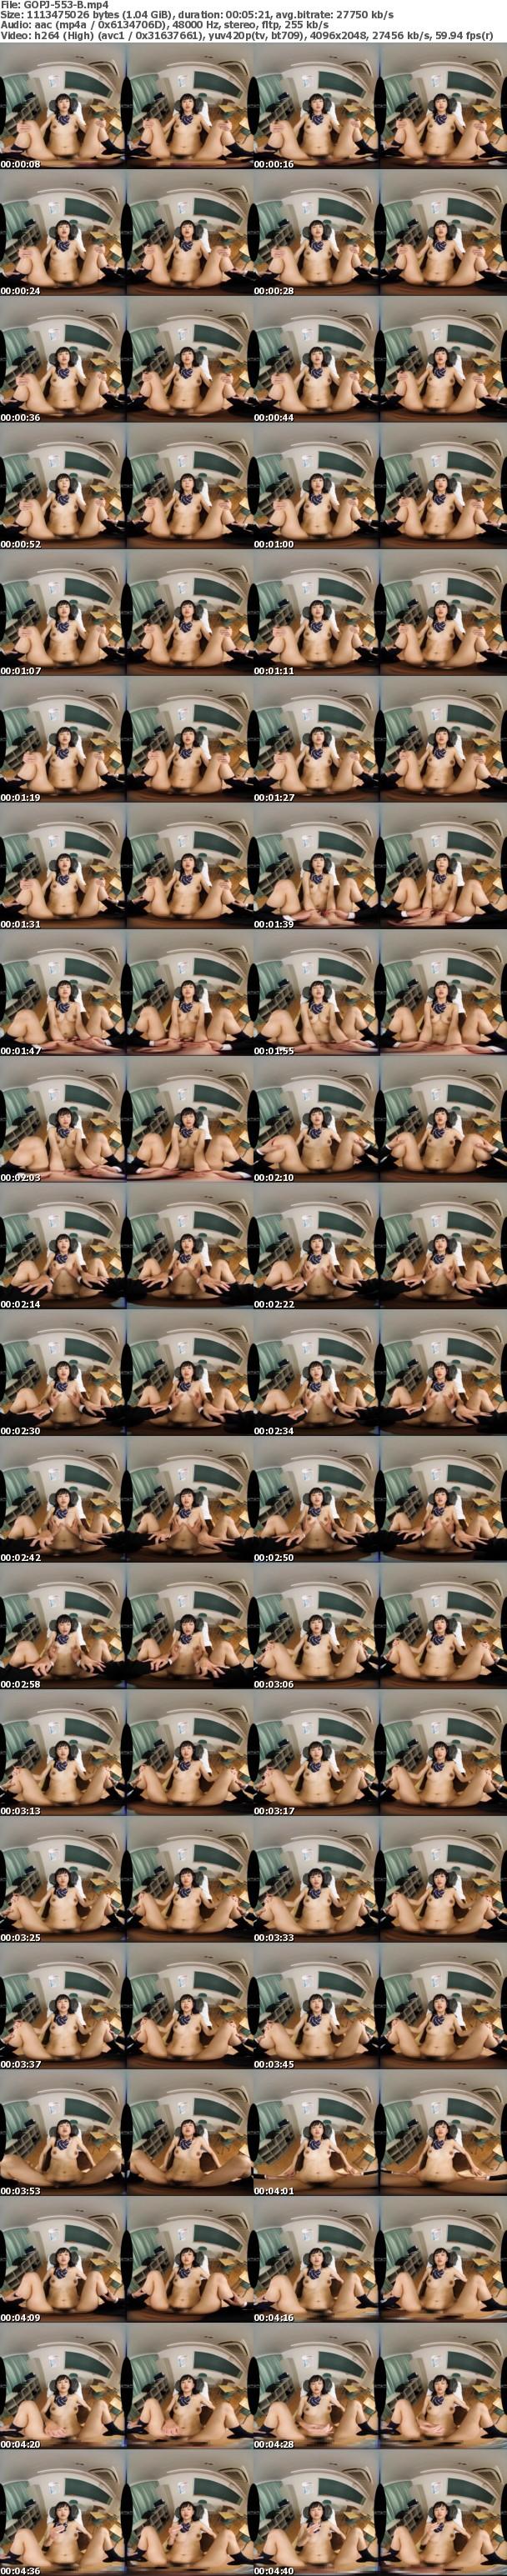 (VR) GOPJ-553 HQ 劇的超高画質 生活指導担当のJ●性指導 単位と引き換えに心までねじ伏せる屈服セックス 一度イクだけじゃ許さない何度もイけ!イけ! 乙葉カレン